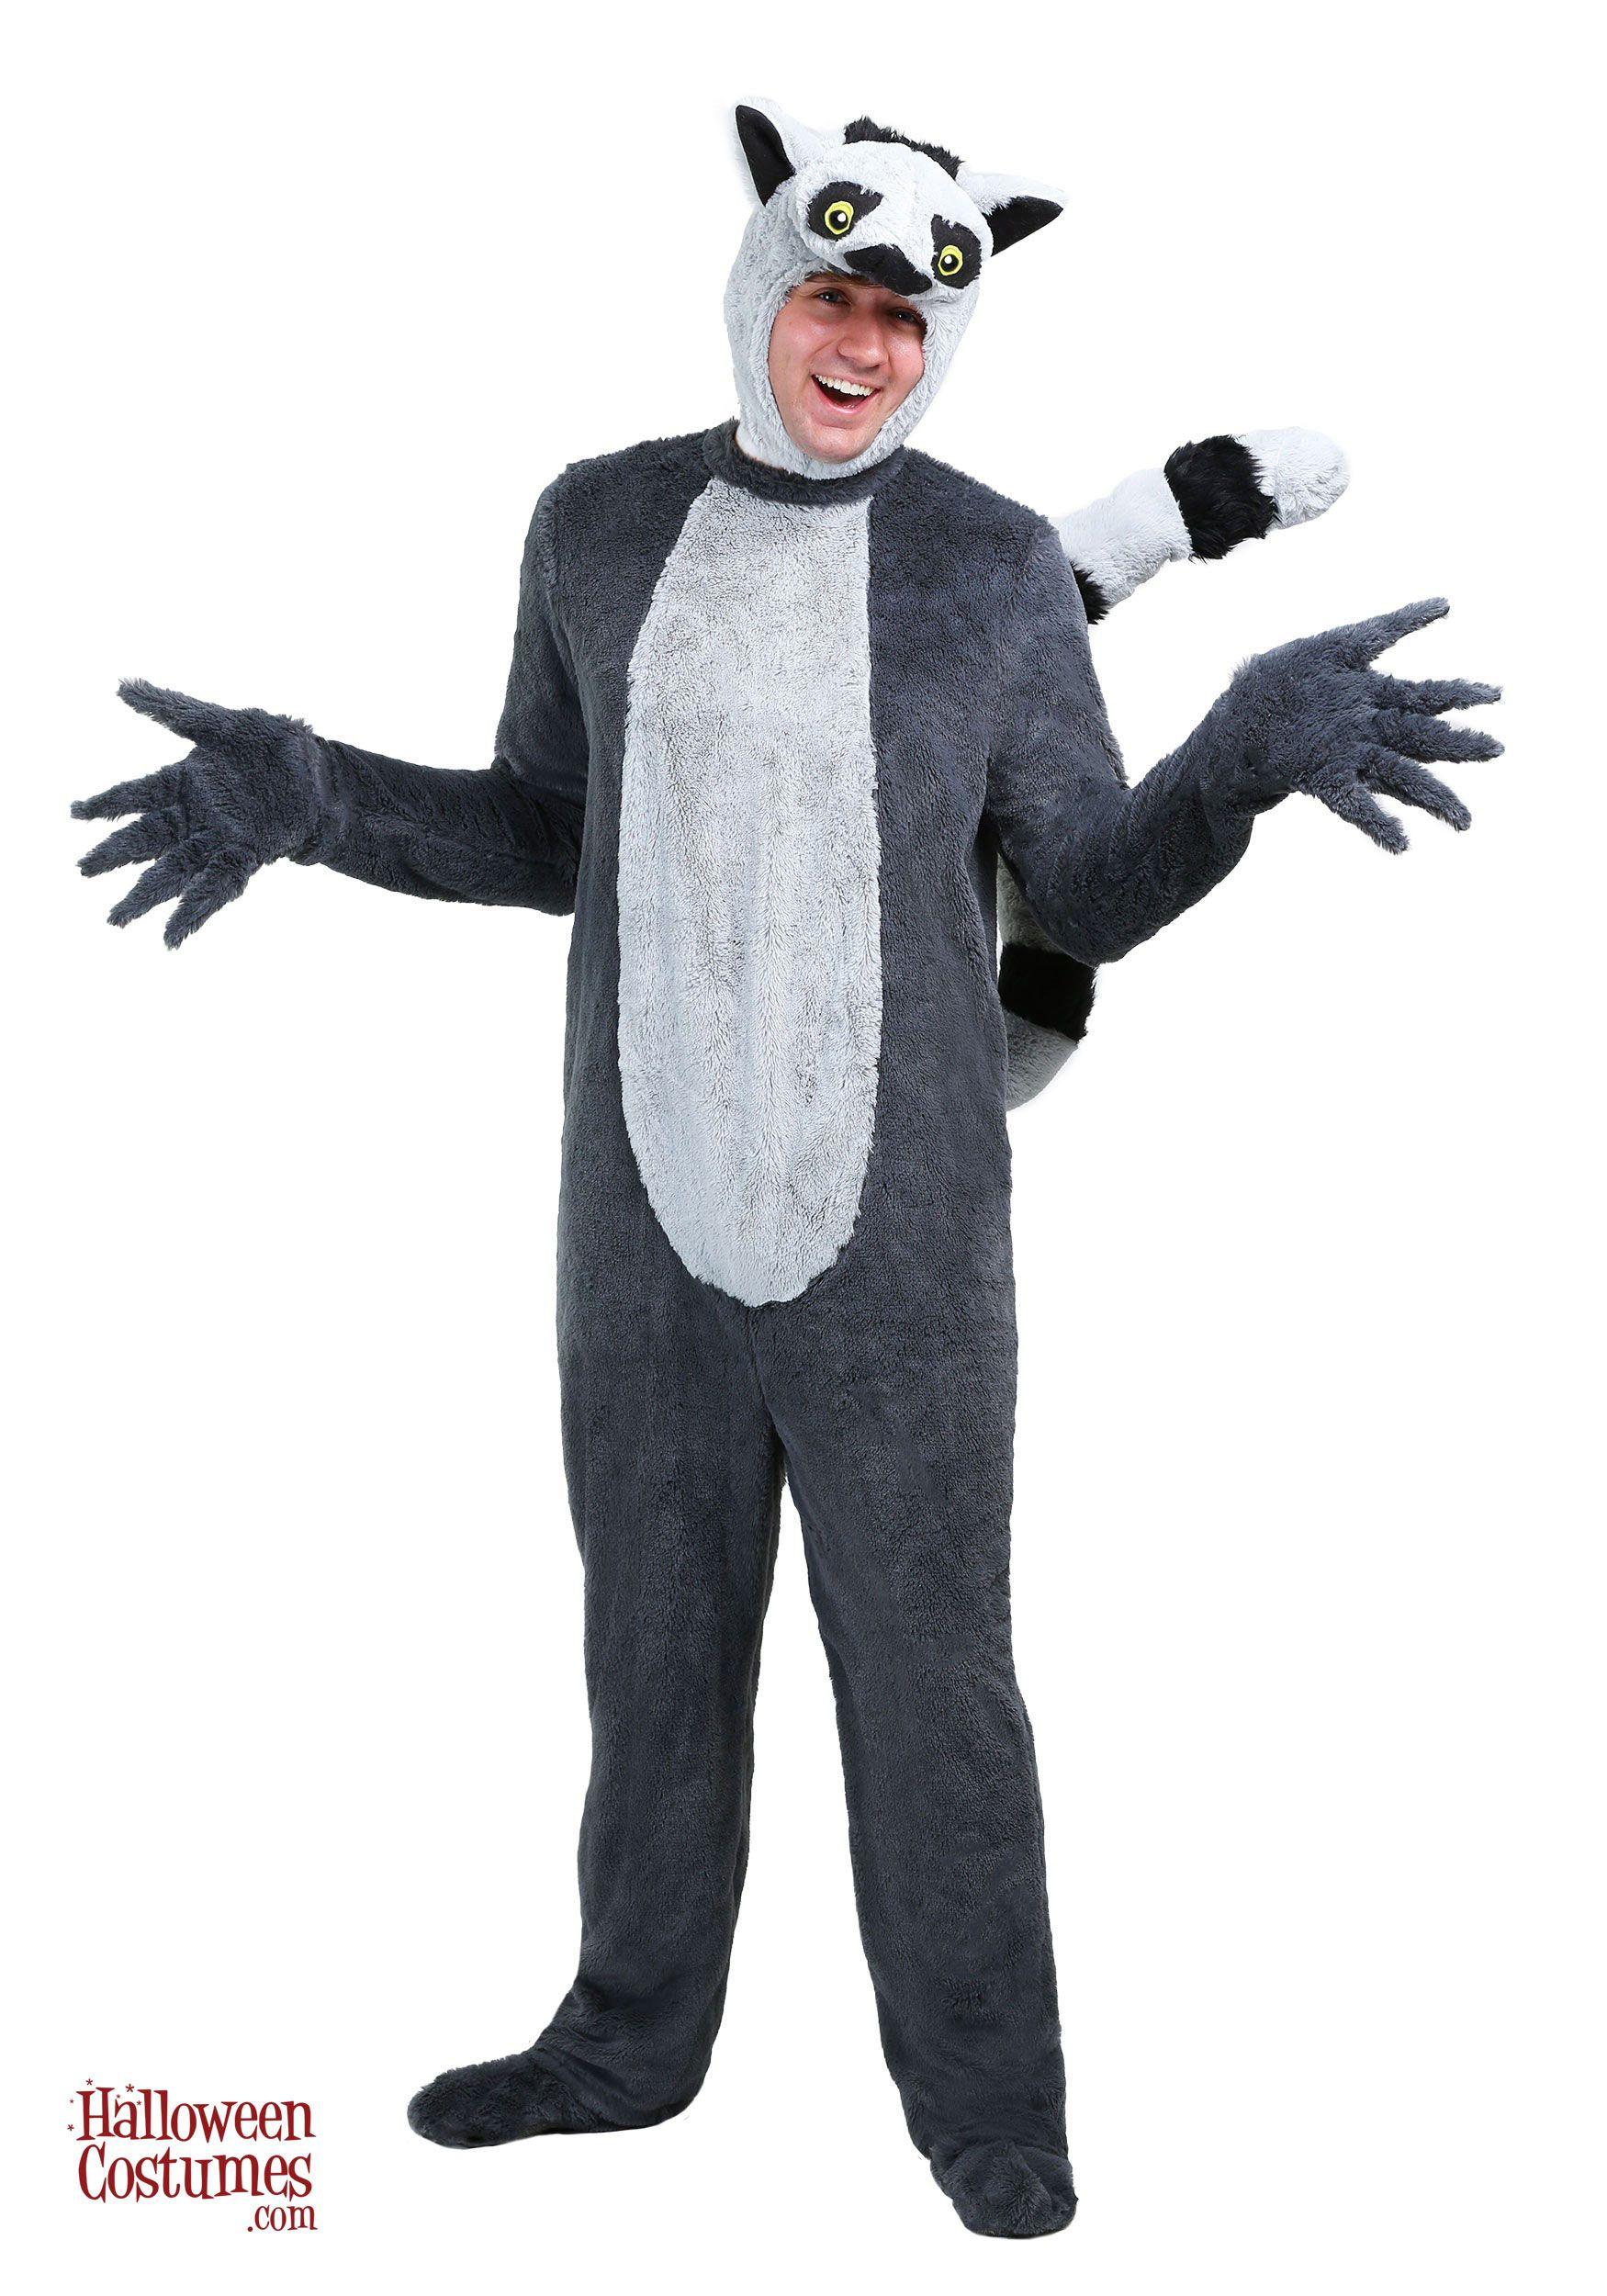 Lemur Adult Costume - Exclusive | Adult costumes, Adult ... - photo#16